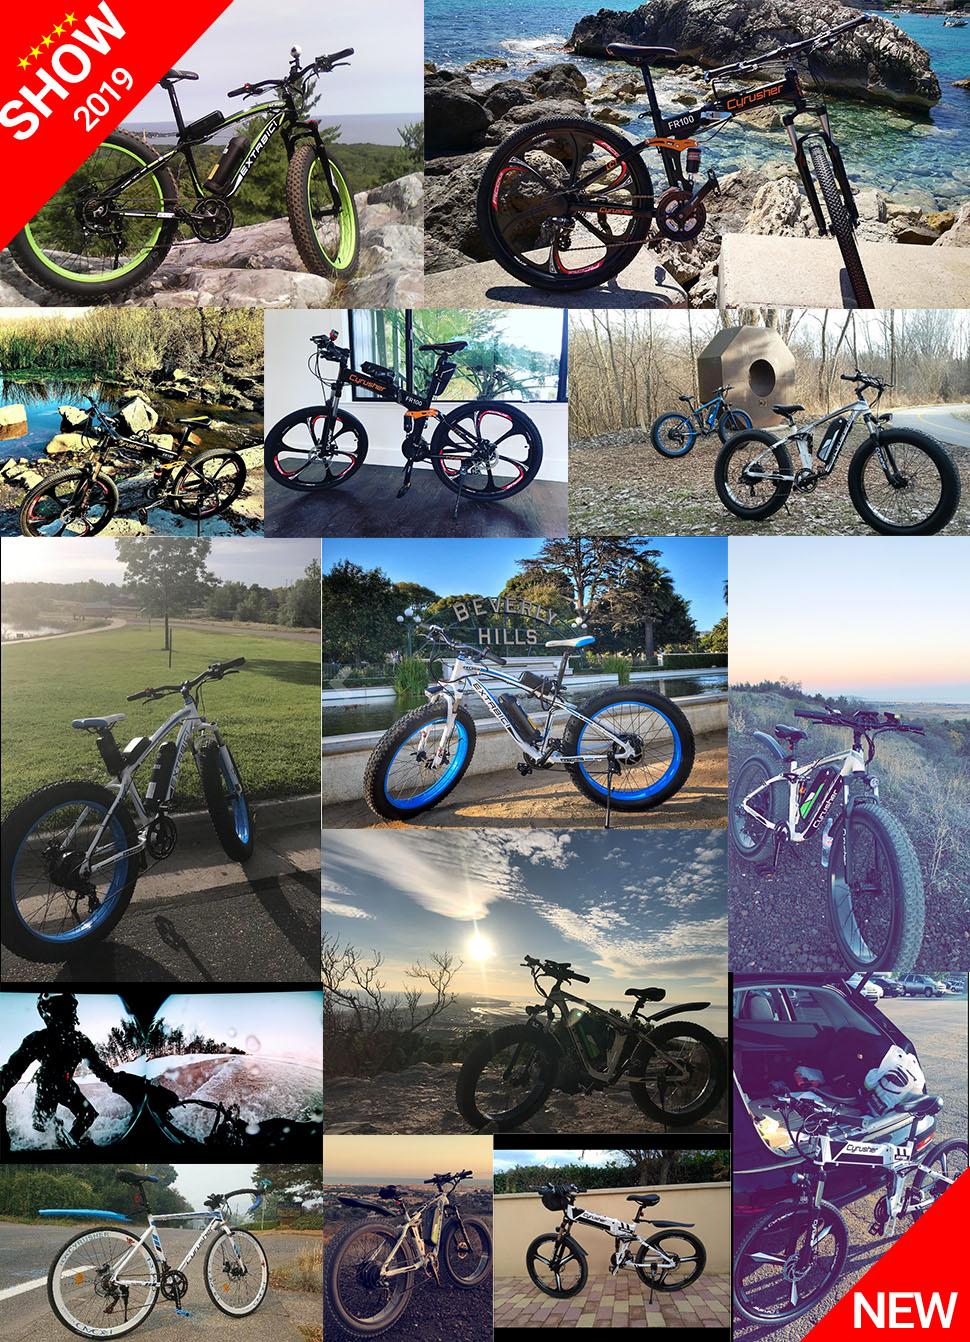 HTB1VjlajDZmx1VjSZFGq6yx2XXad - Cyrusher G650 Upgraded model electrical bike three knife wheel 48V 12.8AH 52 part 2600MAH li Electrical bicycle with sensible odometer